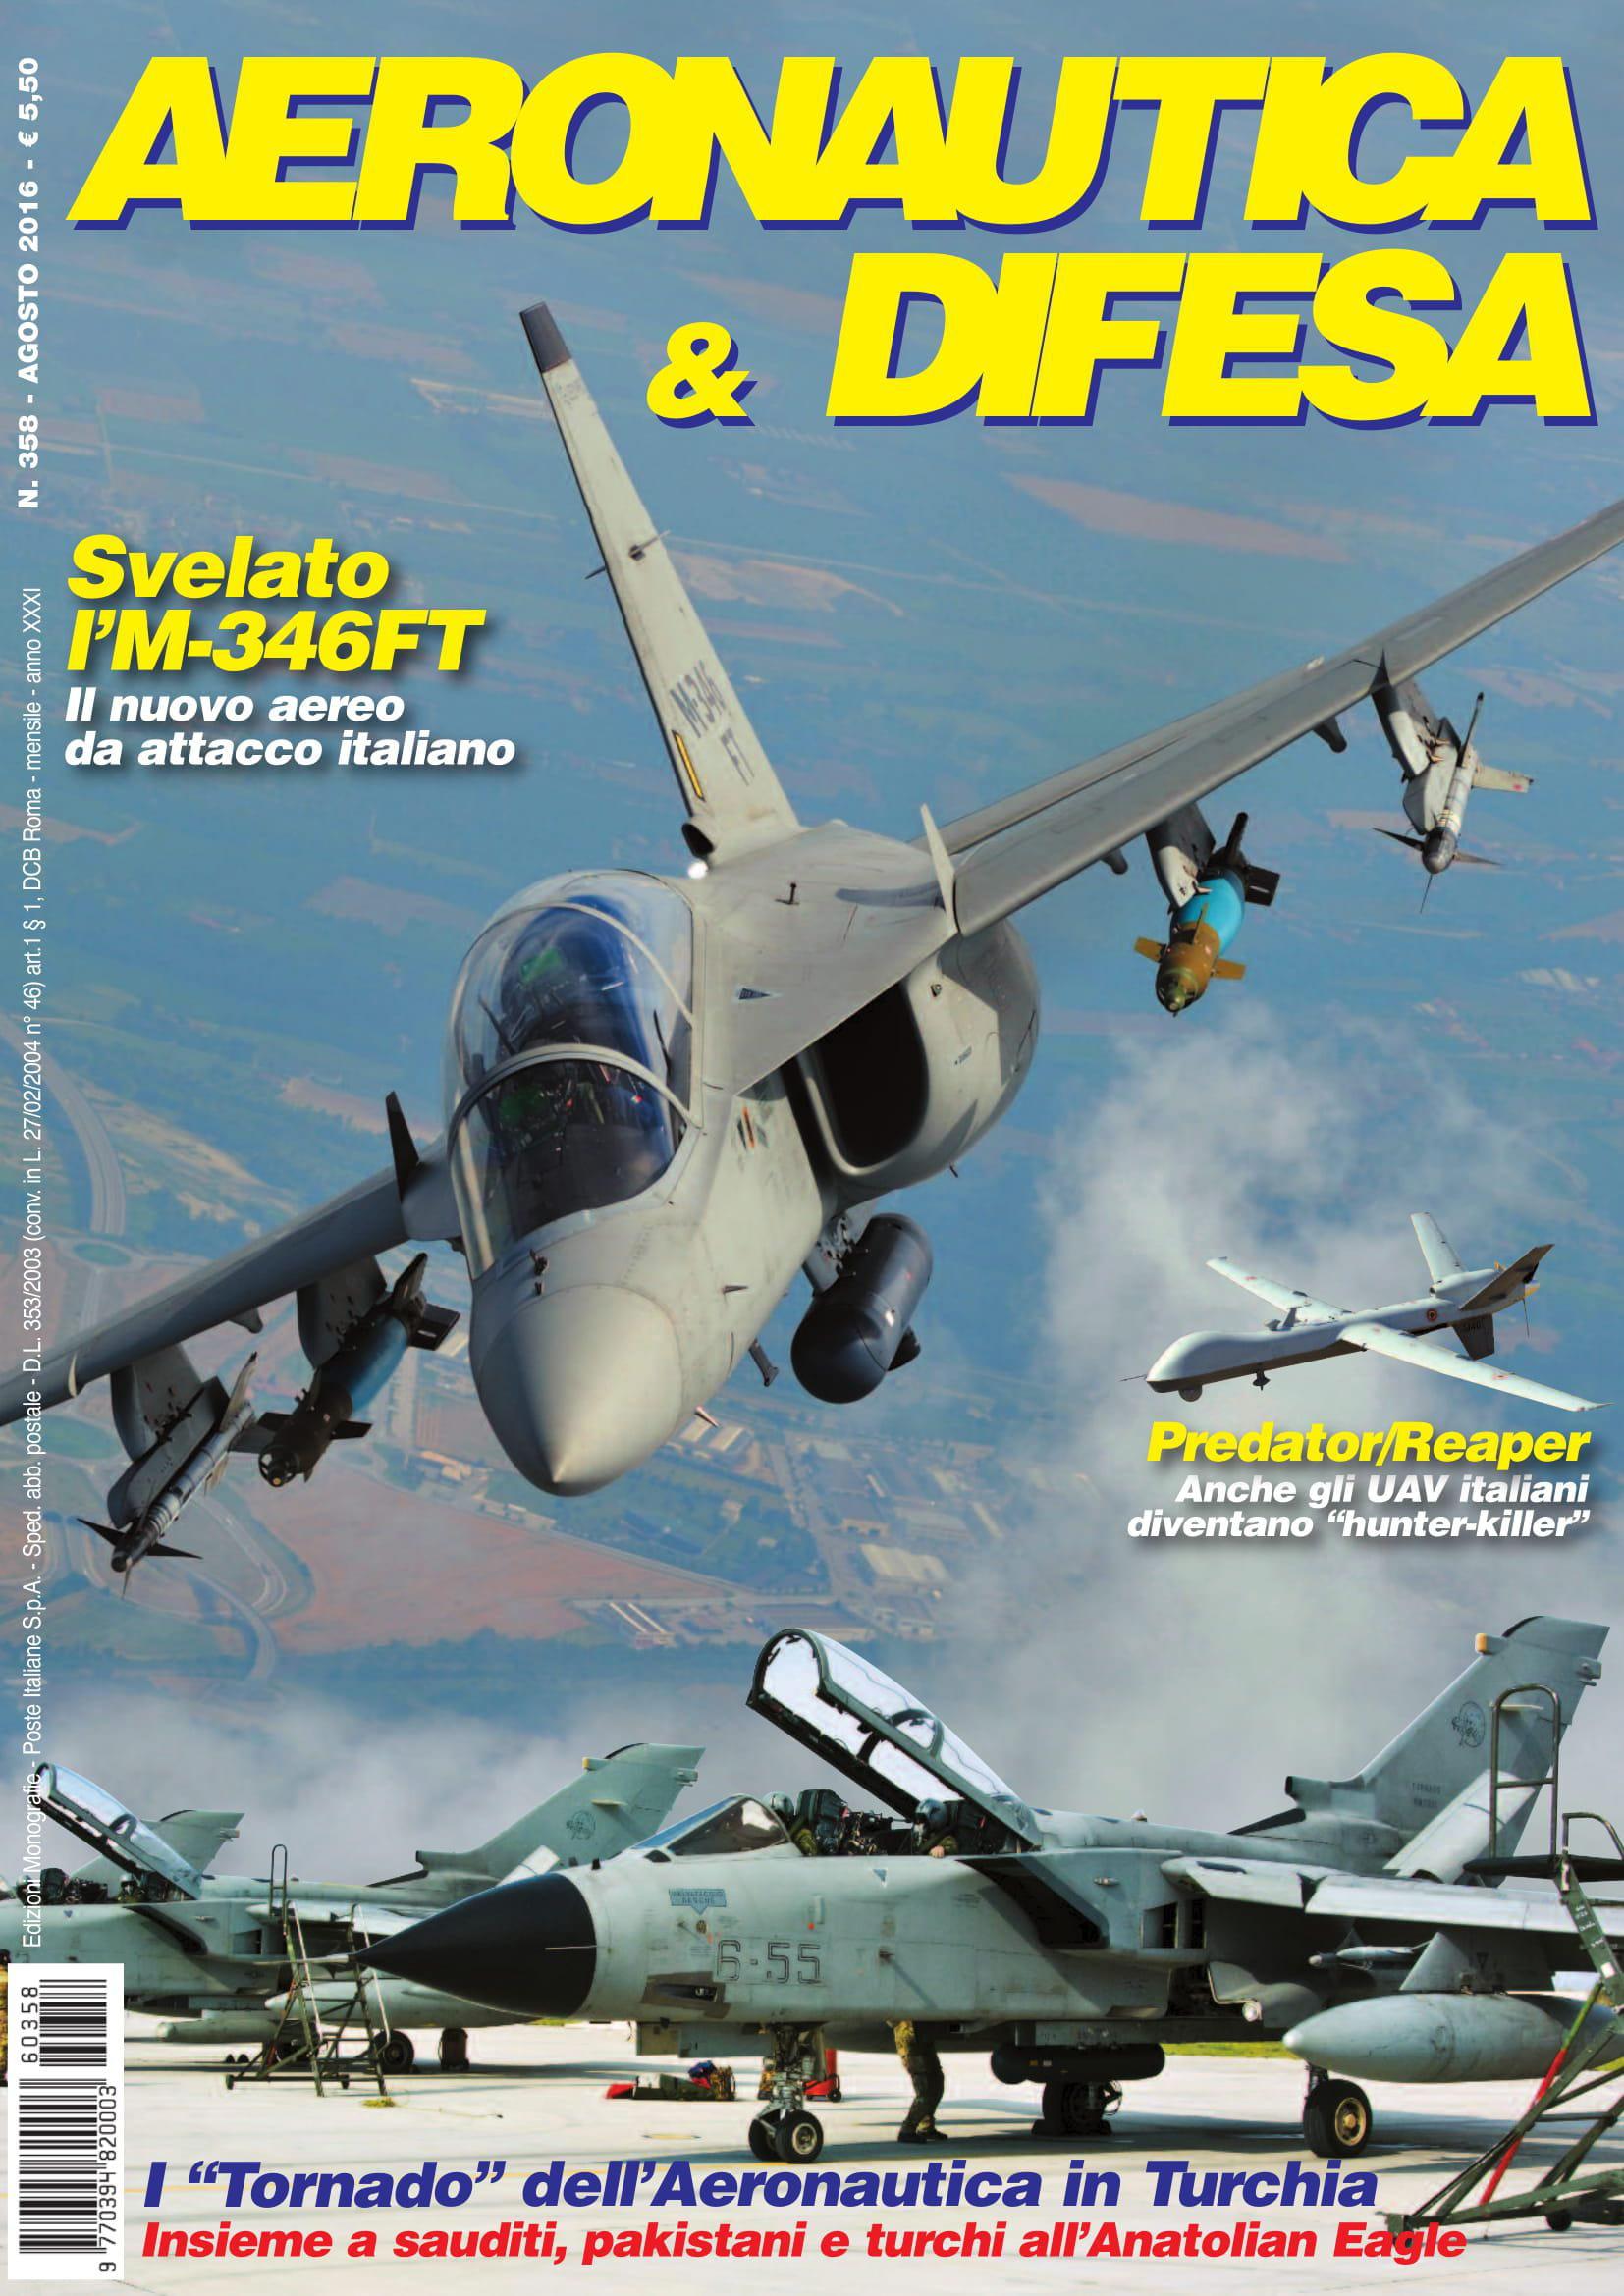 Aeronautica & Difesa (IT)_US Army Apaches in Europe-1